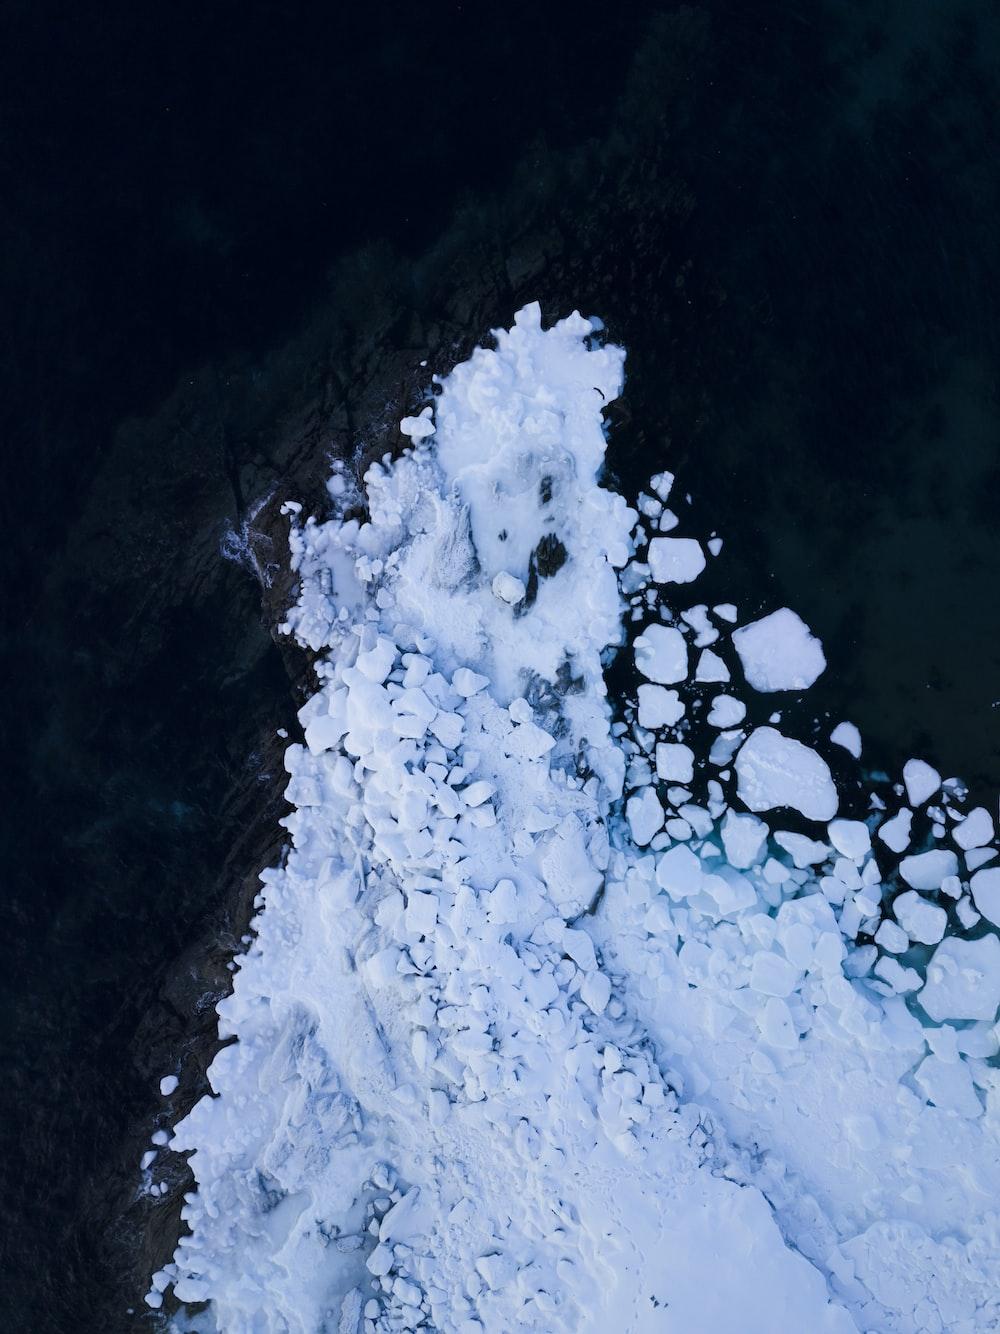 white snow on black surface